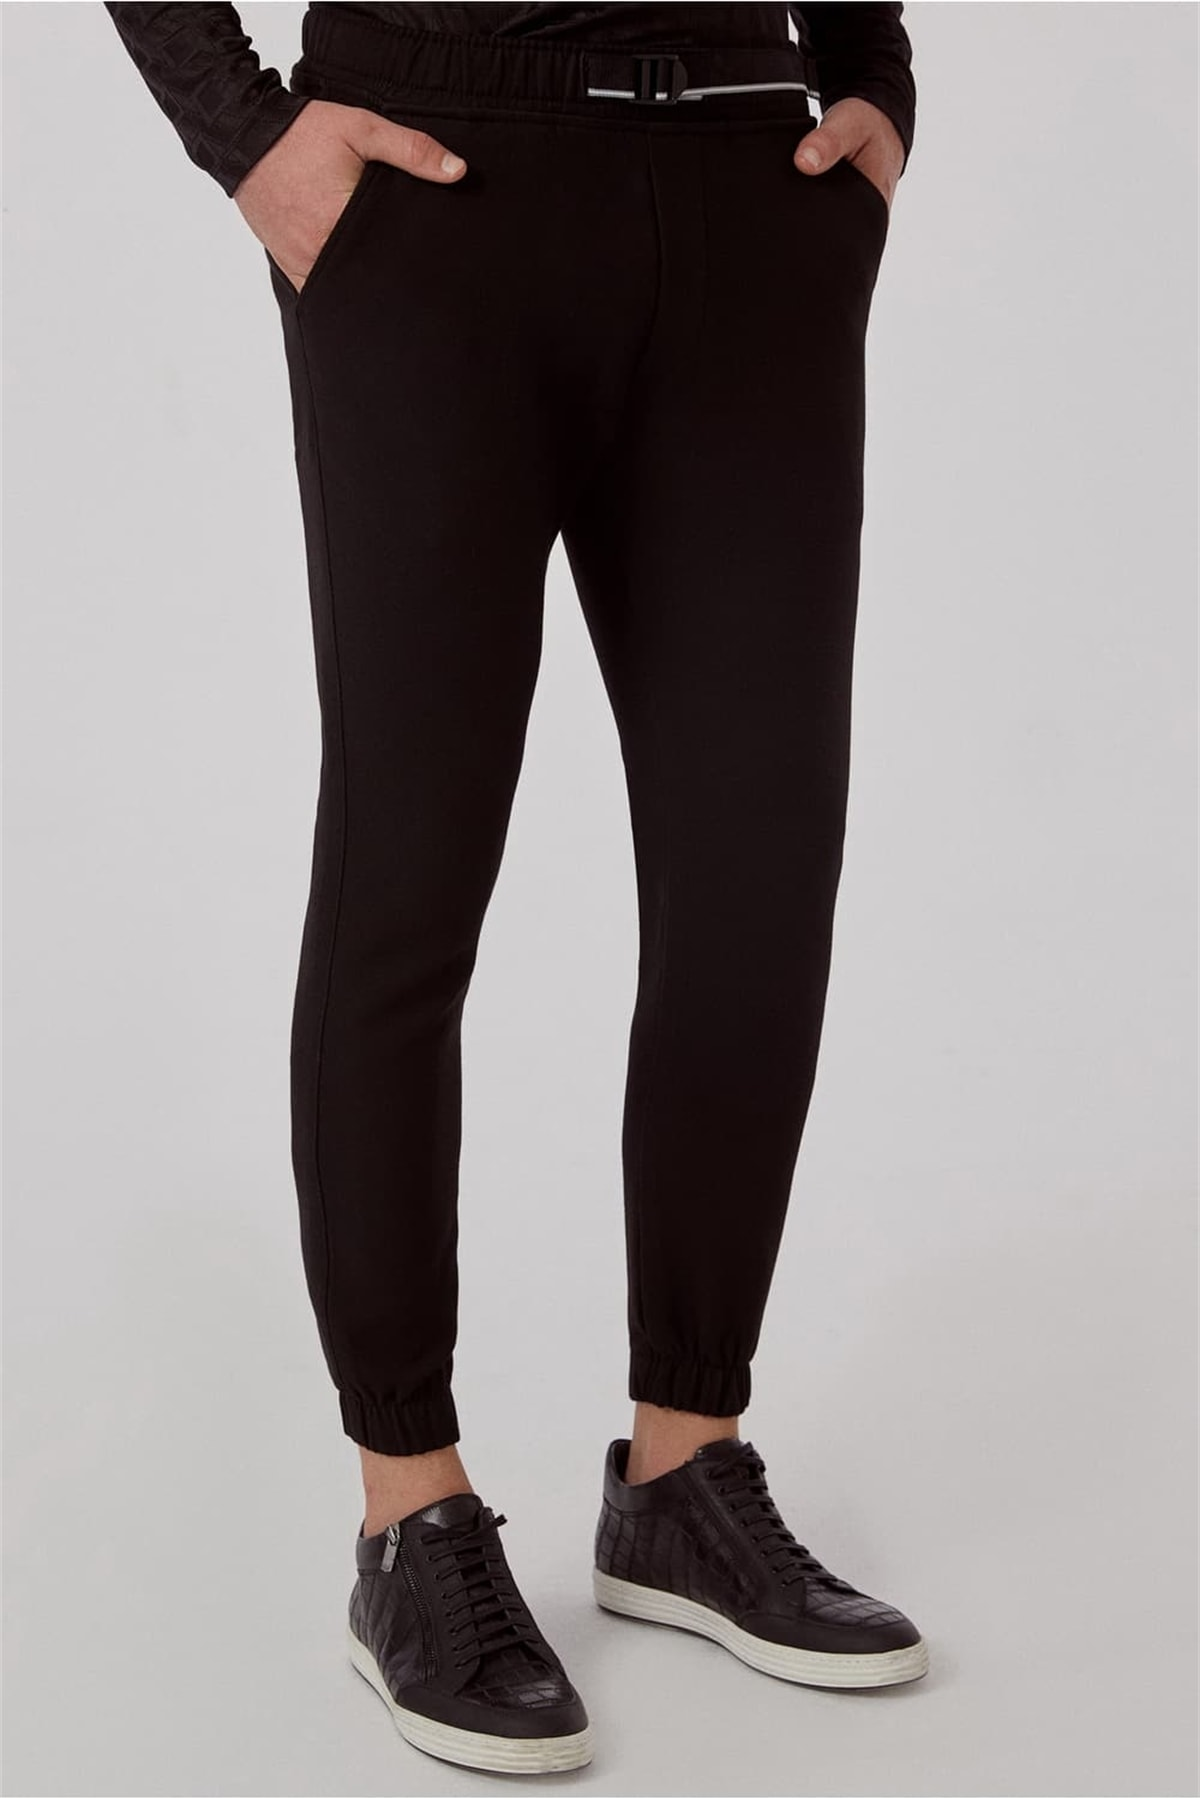 Efor ATP 017 Slim Fit Siyah Spor Pantolon 1